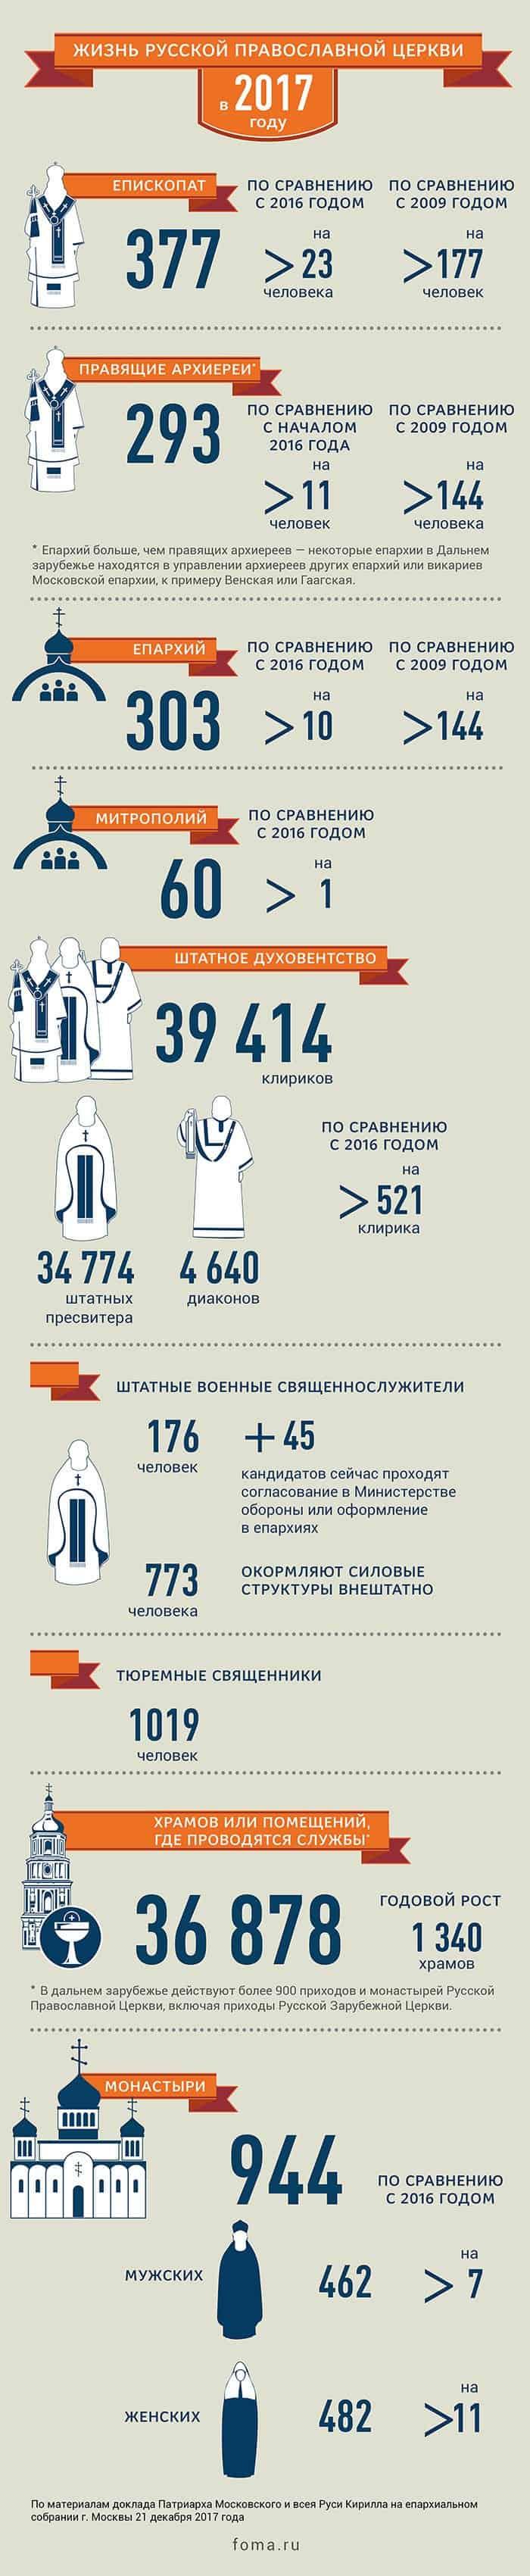 Русская Православная Церковь в 2017 году. Цифры